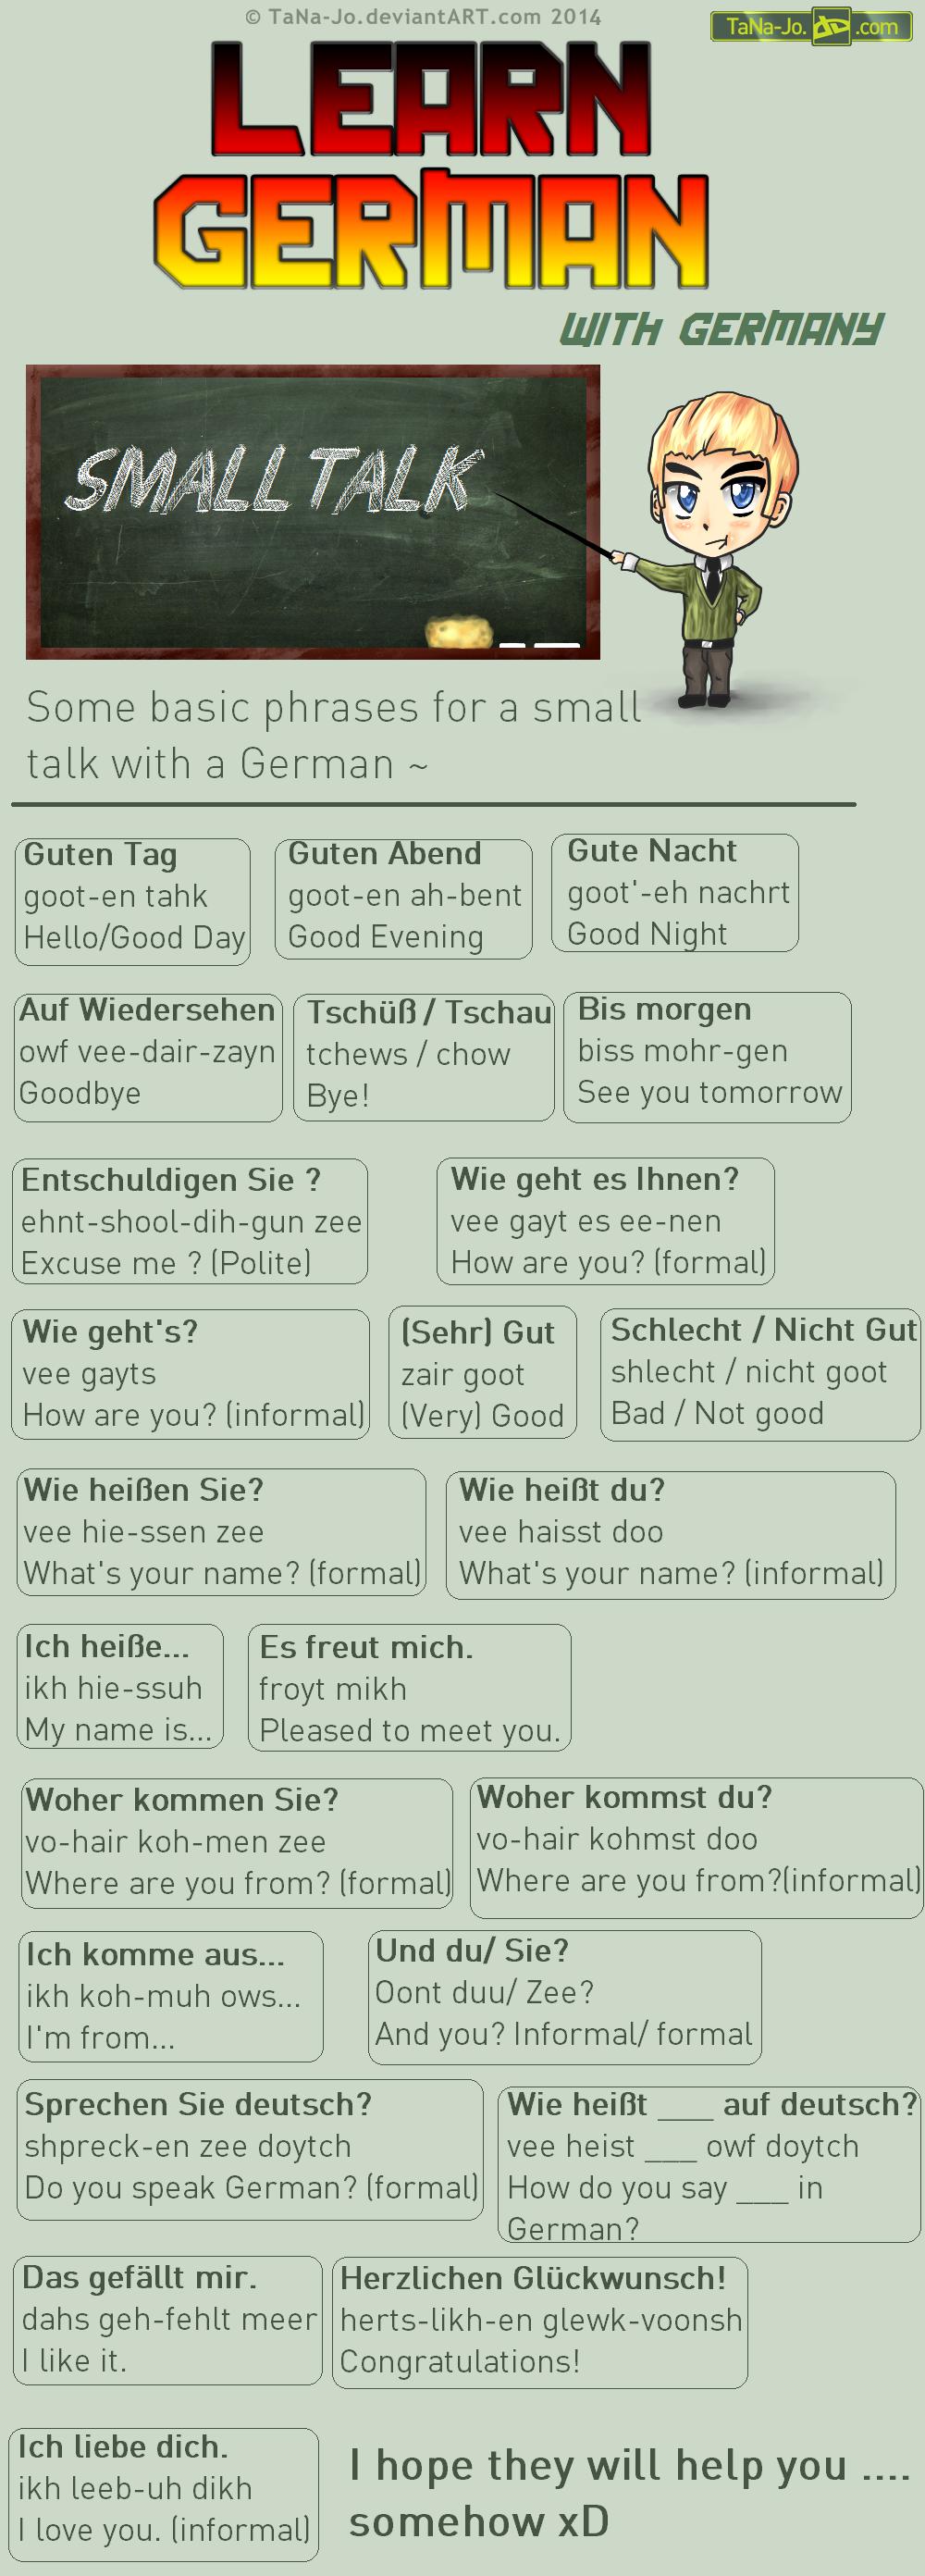 Learn German Online for Free at deutsch-lernen.com